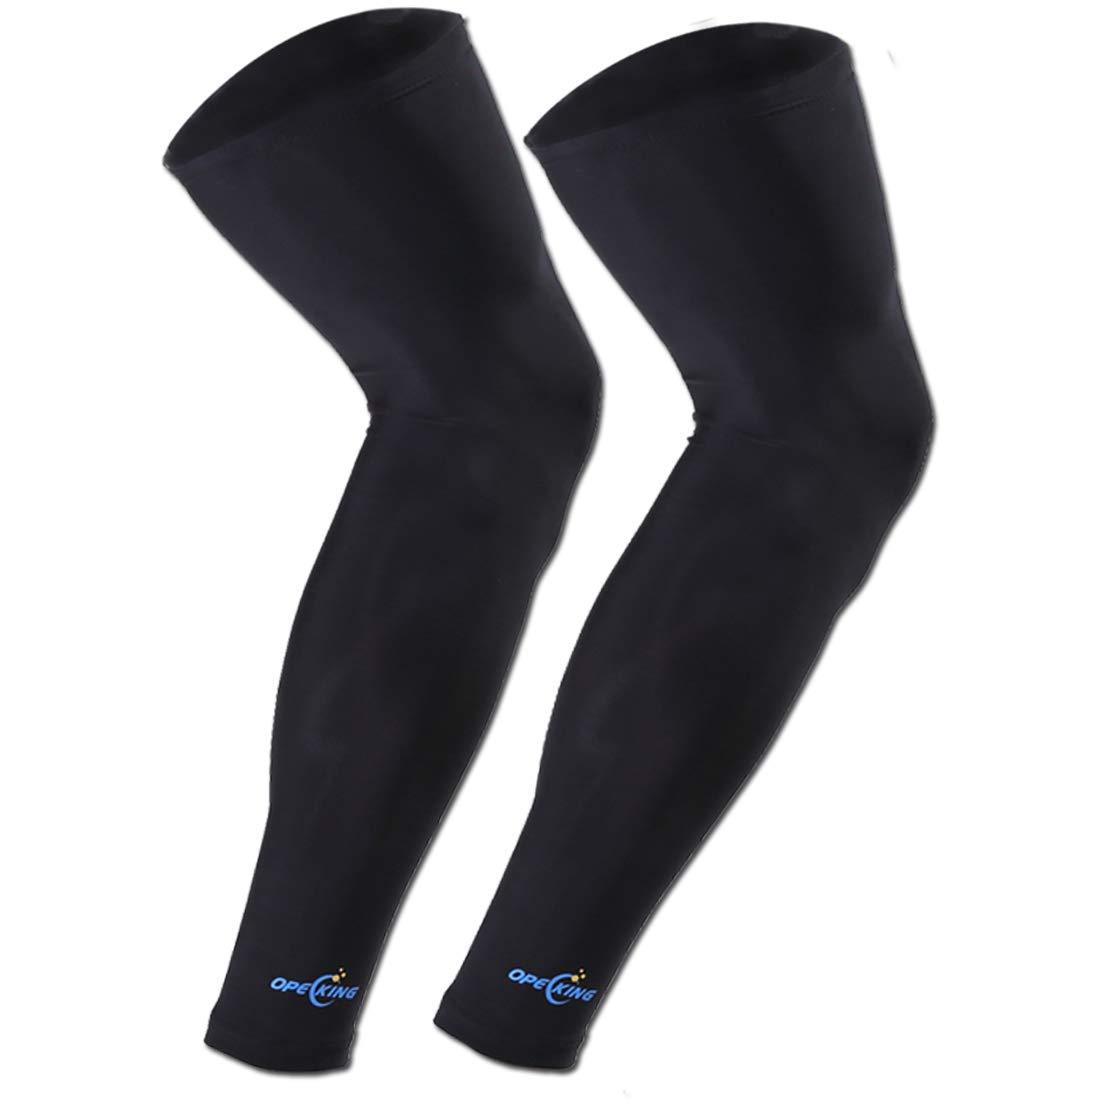 1 Pair Compression Leg Sleeve Non Slip Knee Long Sleeve Leggings for Shin Splints,Running,Medical Care,Travel,Pain Relief for Men and Women